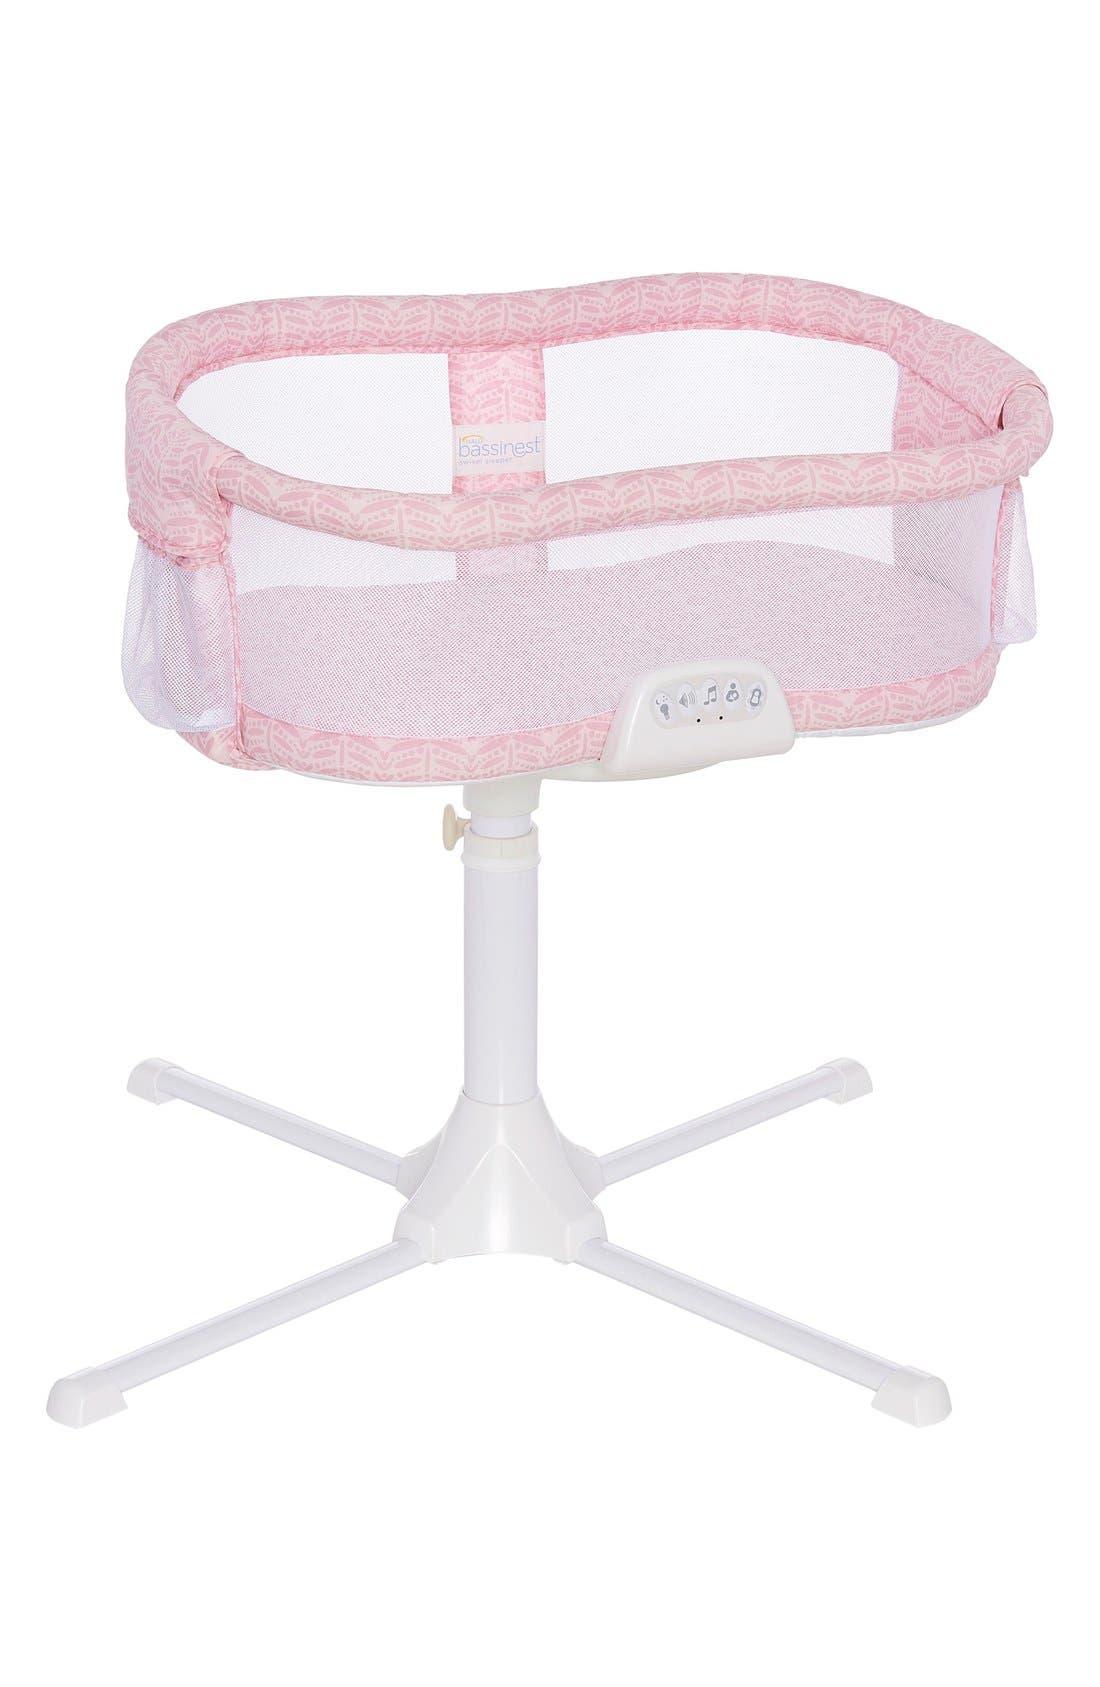 Halo Innovations Bassinest<sup>™</sup> Bedside Swivel Sleeper,                         Main,                         color, Pink Fern